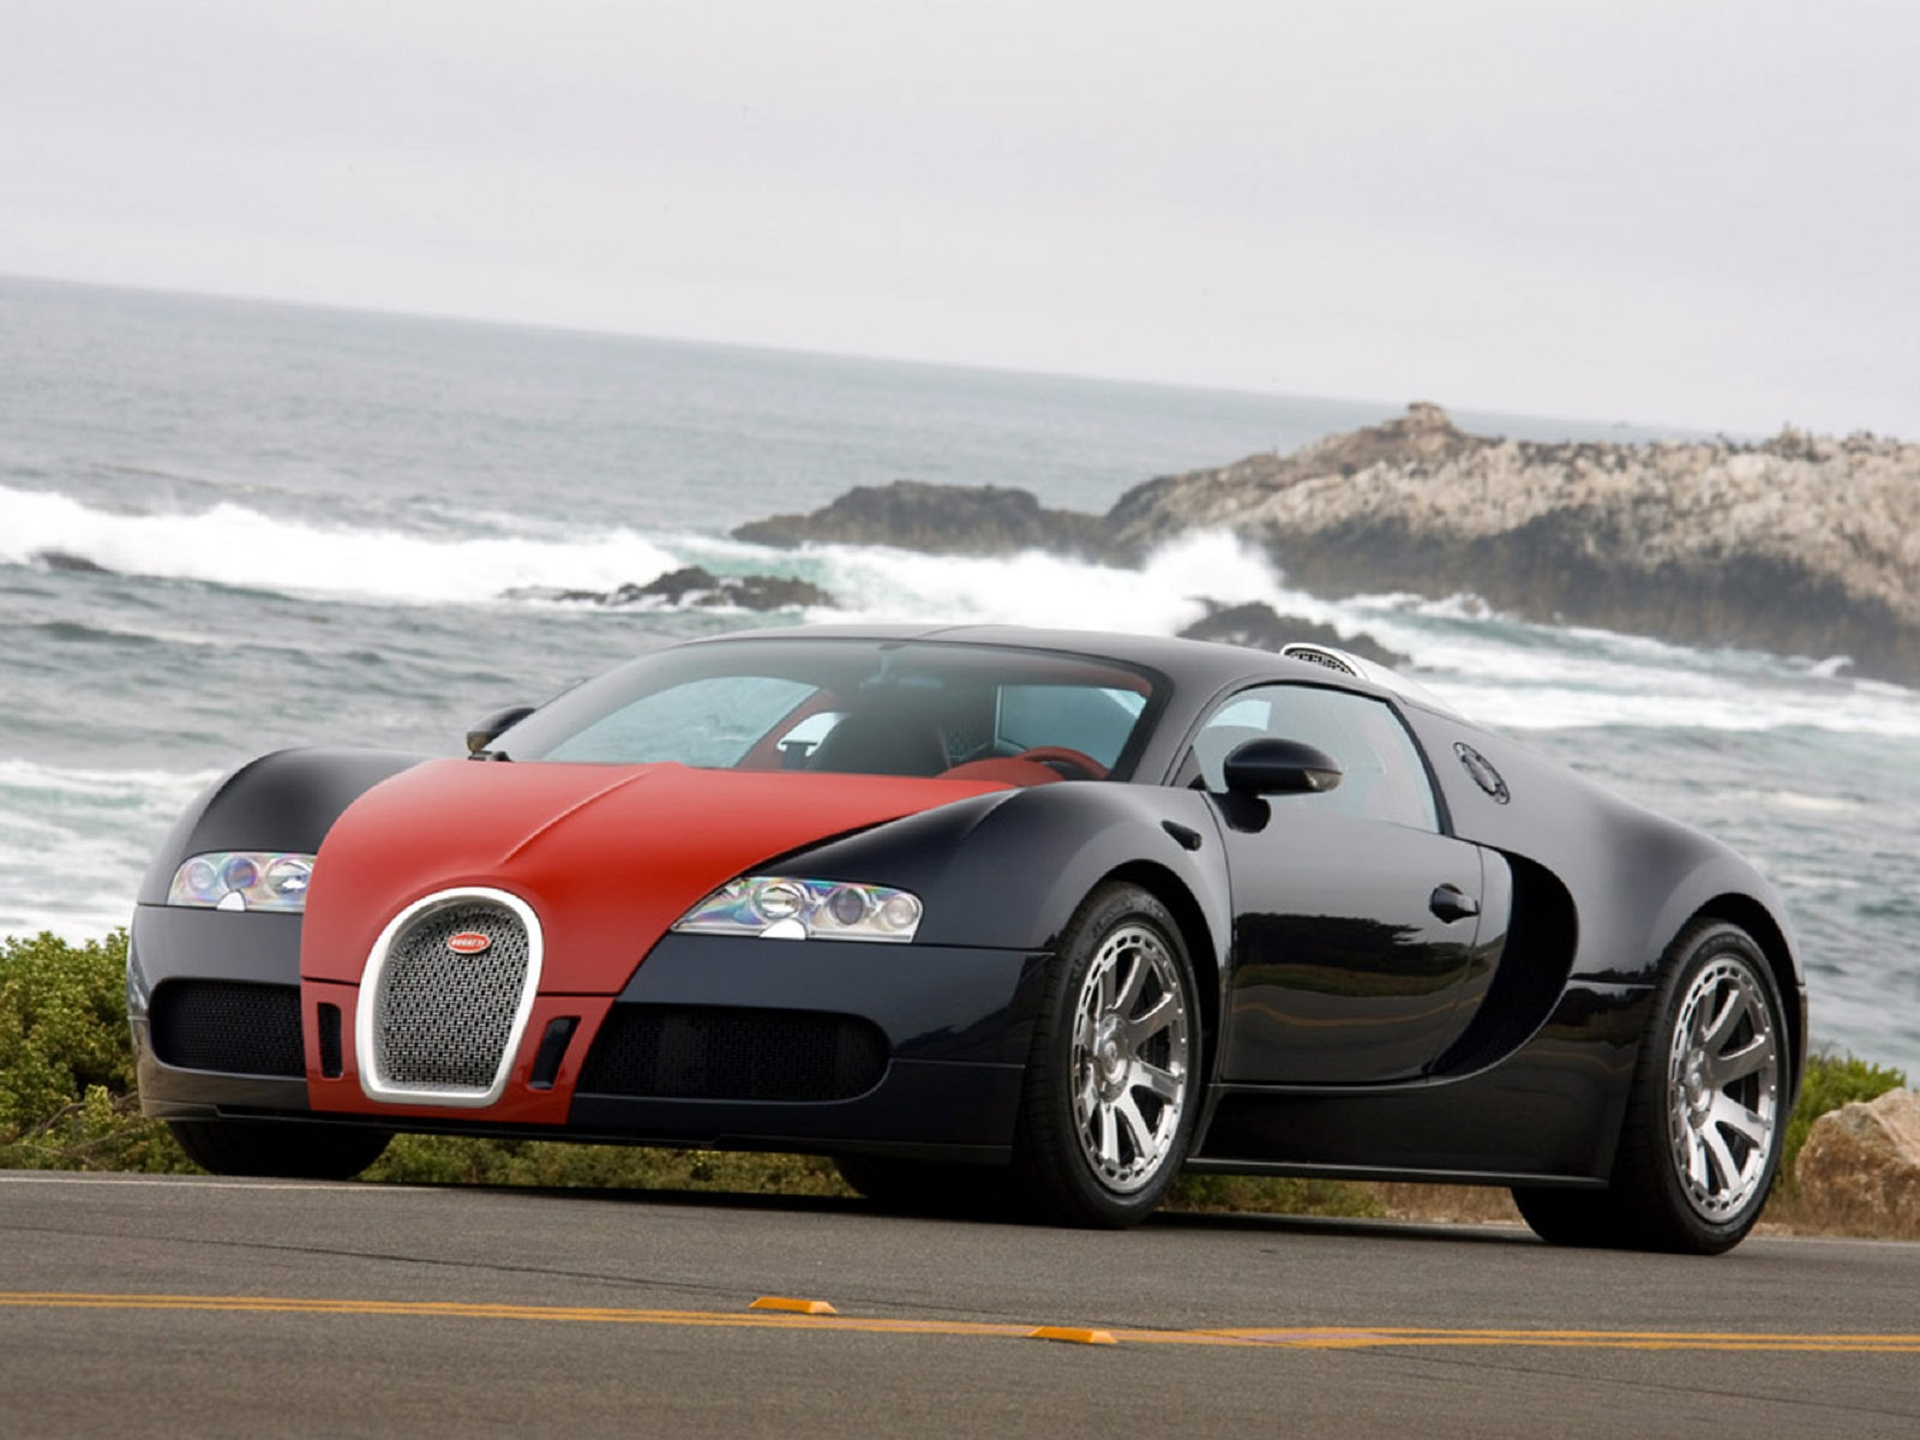 Pictures Of Bugatti Veyron